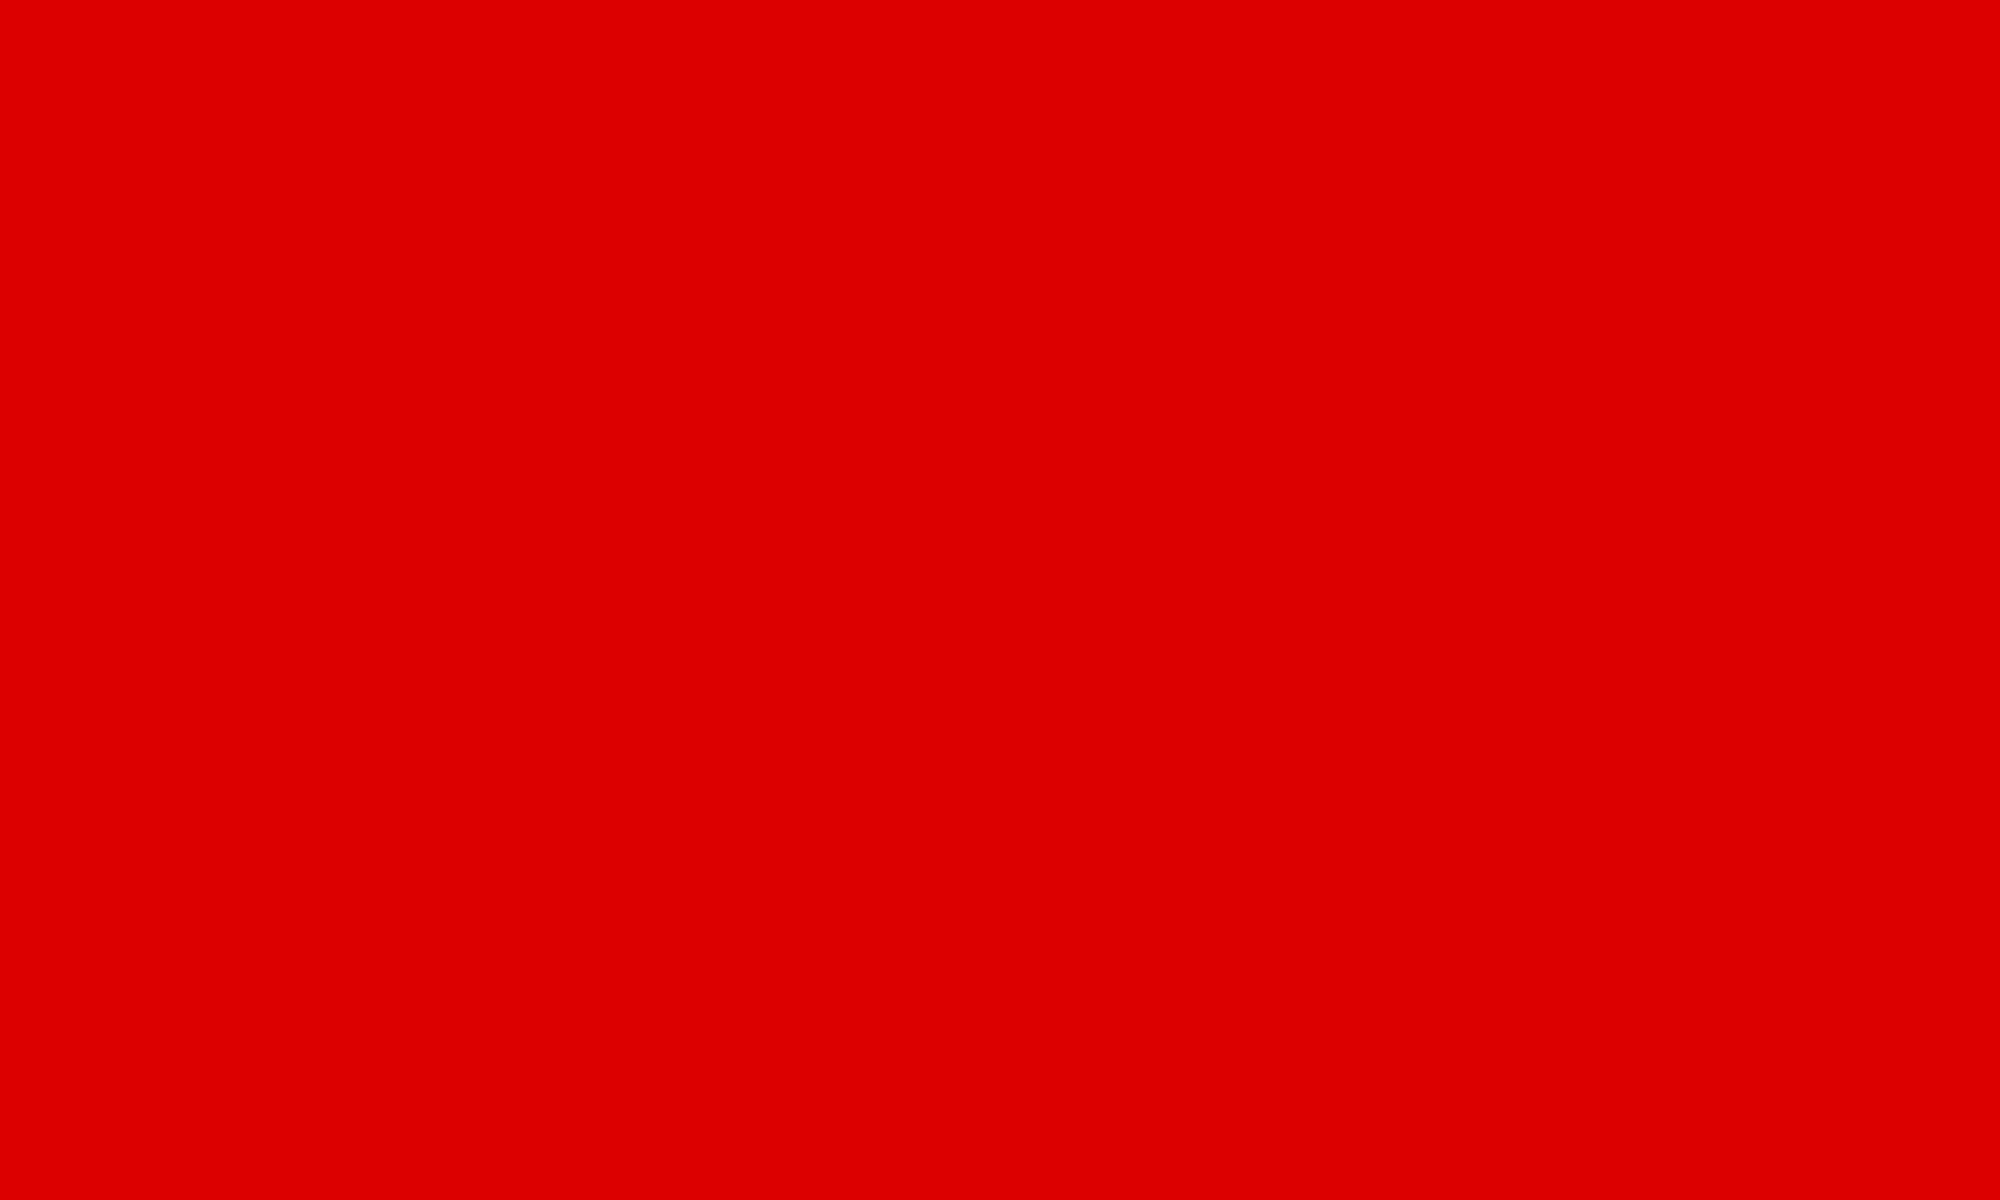 Red   Heroes Wiki   Fandom powered by Wikia